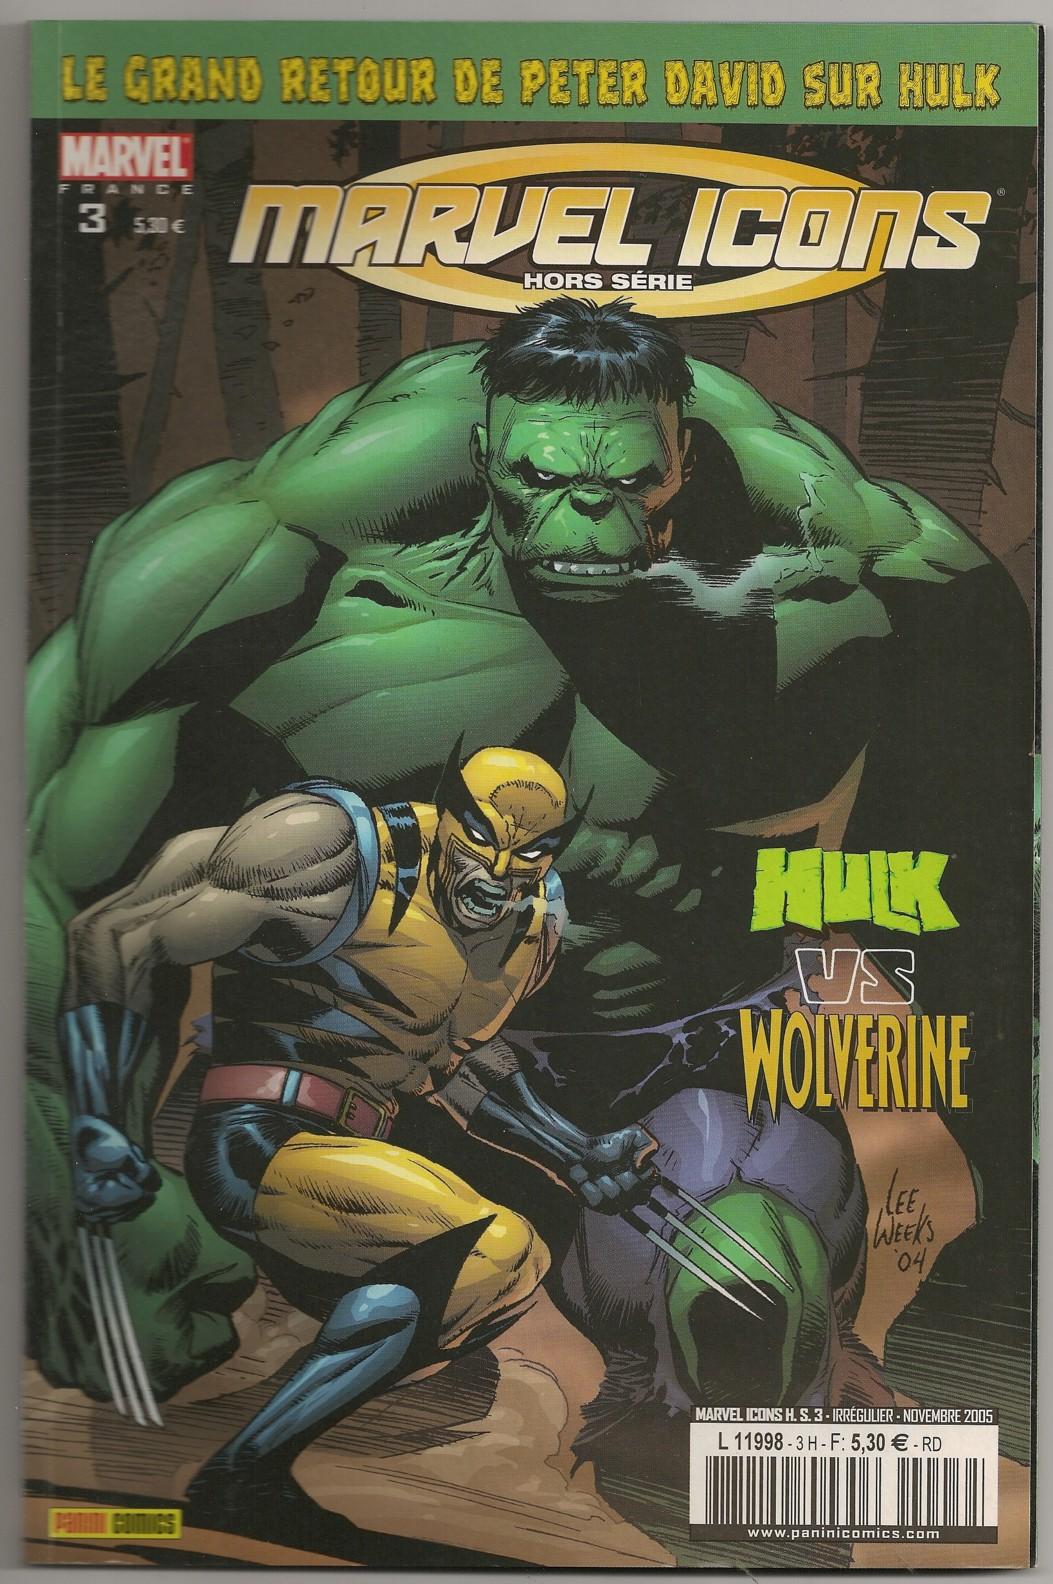 Marvel Icons Hors Série 3 - Hulk Vs Wolverine